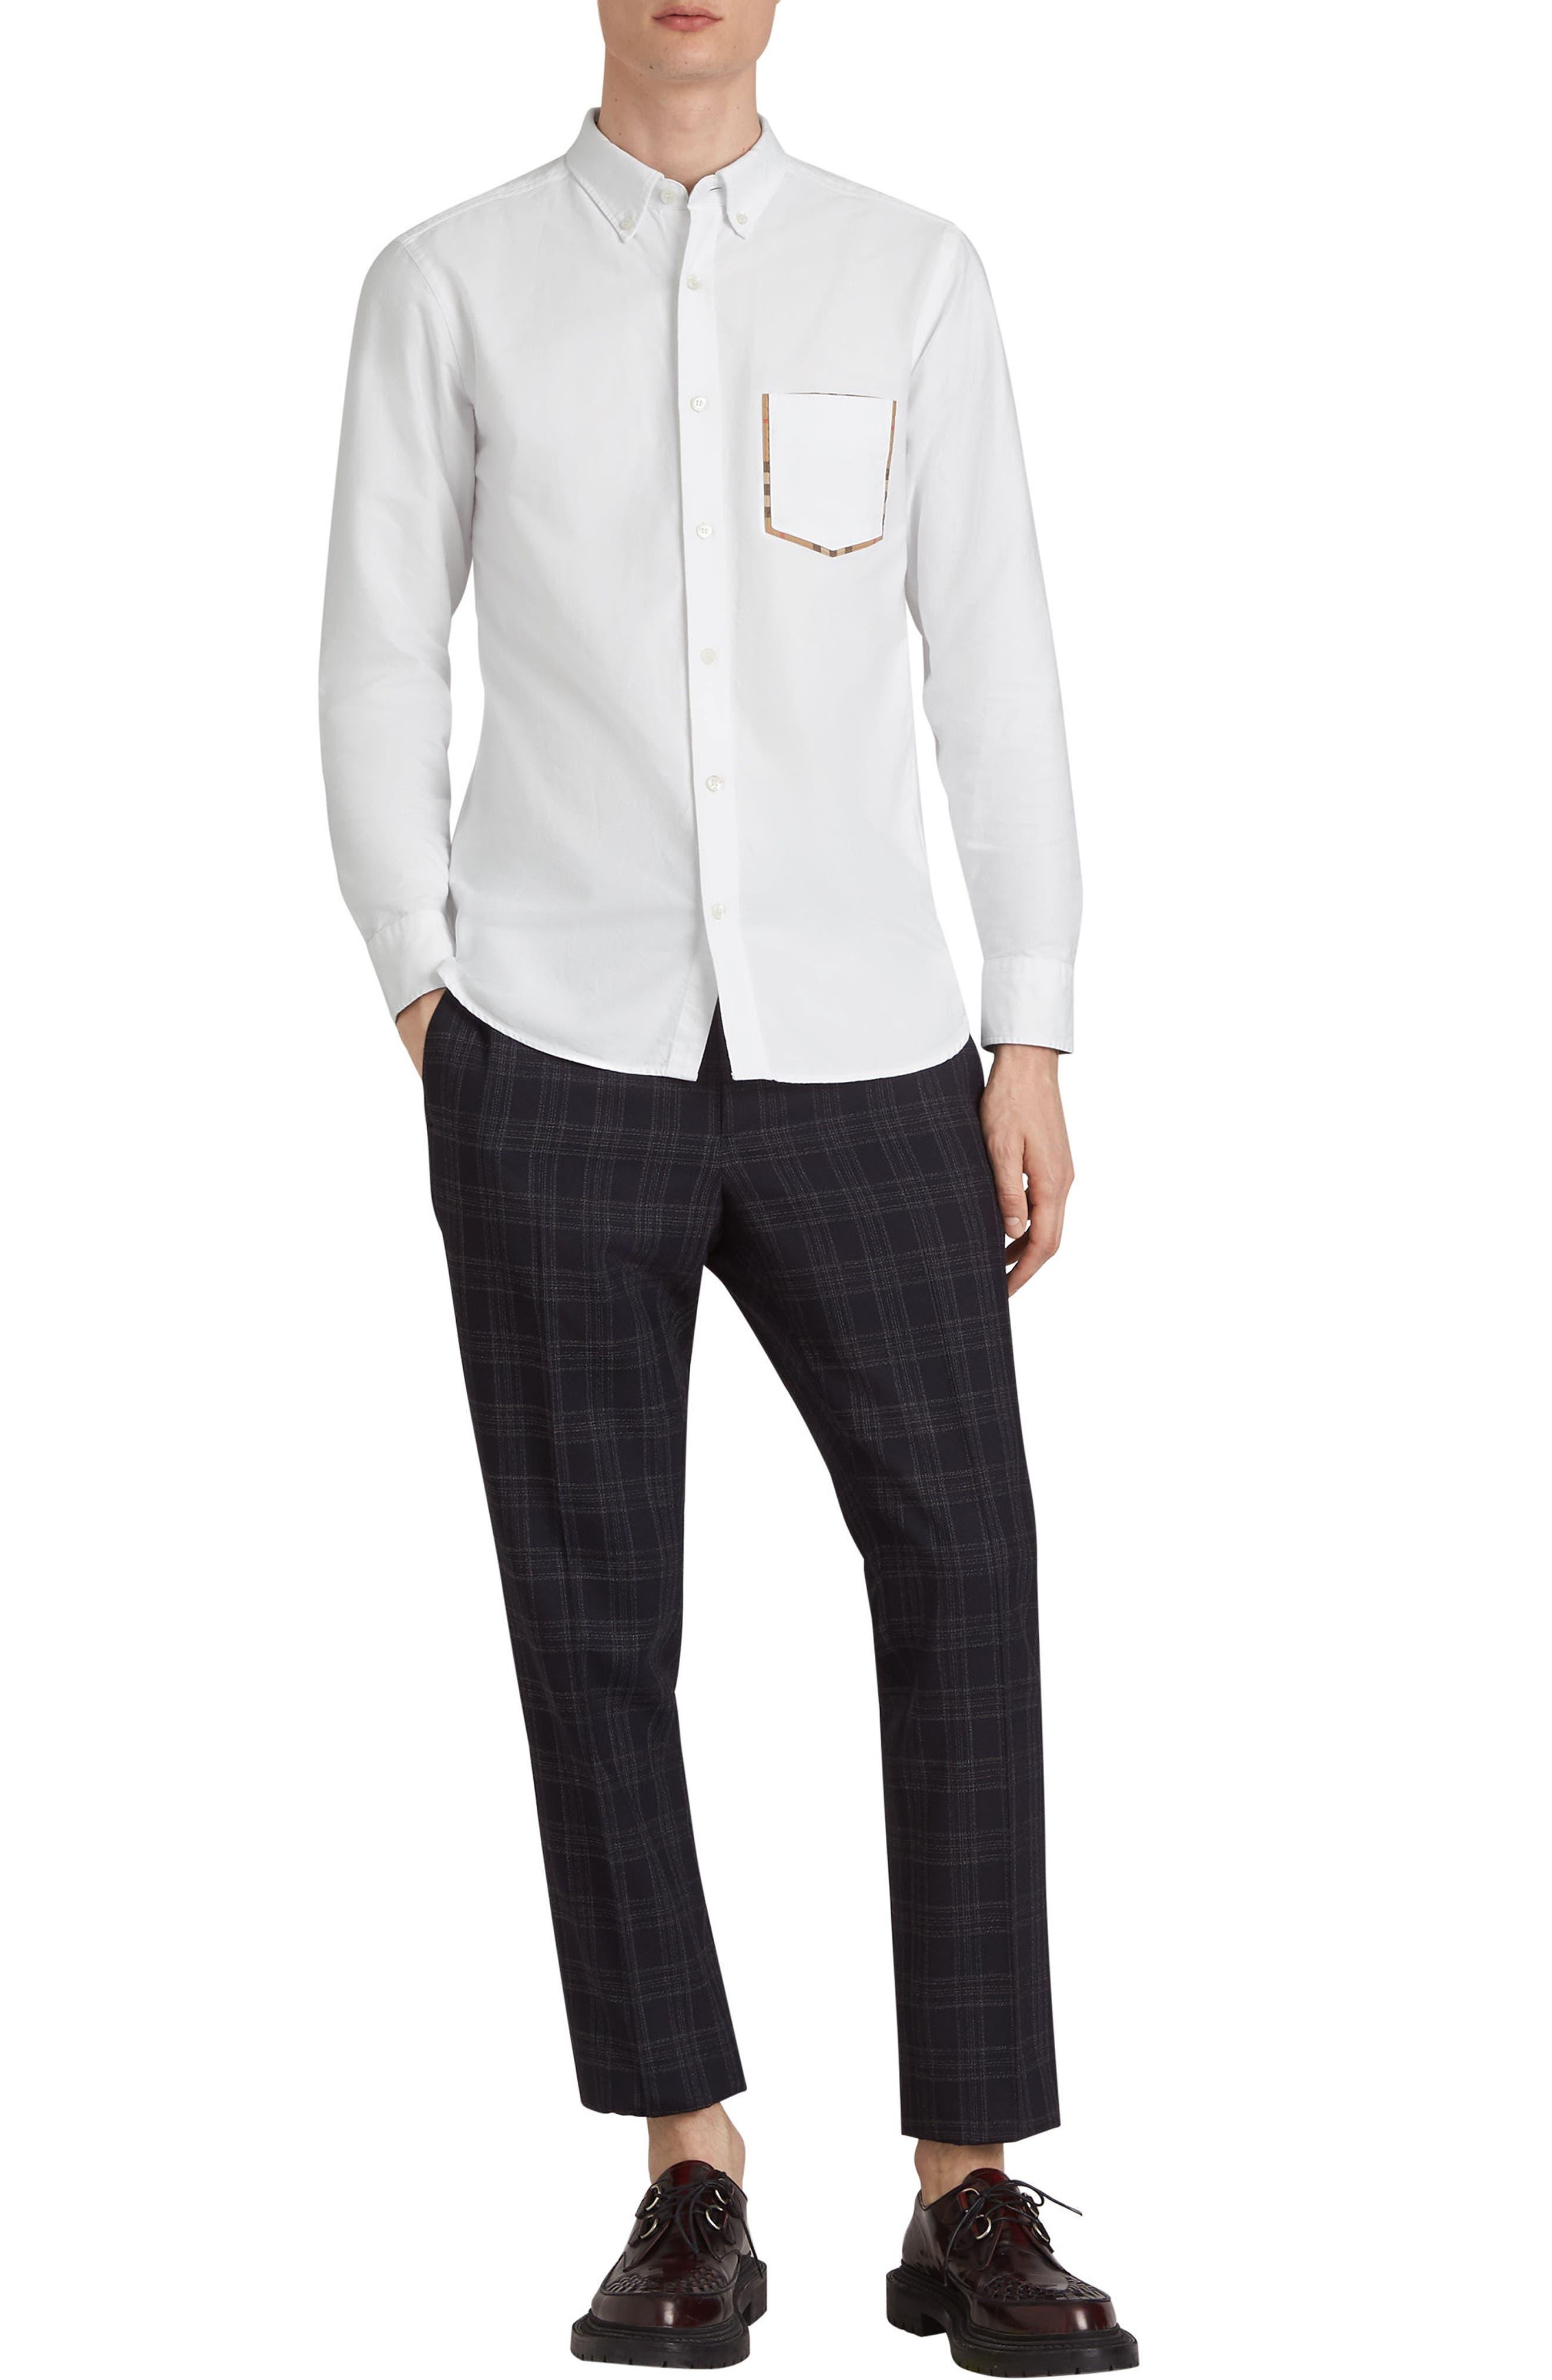 BURBERRY,                             Harry Check Trim Sport Shirt,                             Alternate thumbnail 7, color,                             WHITE